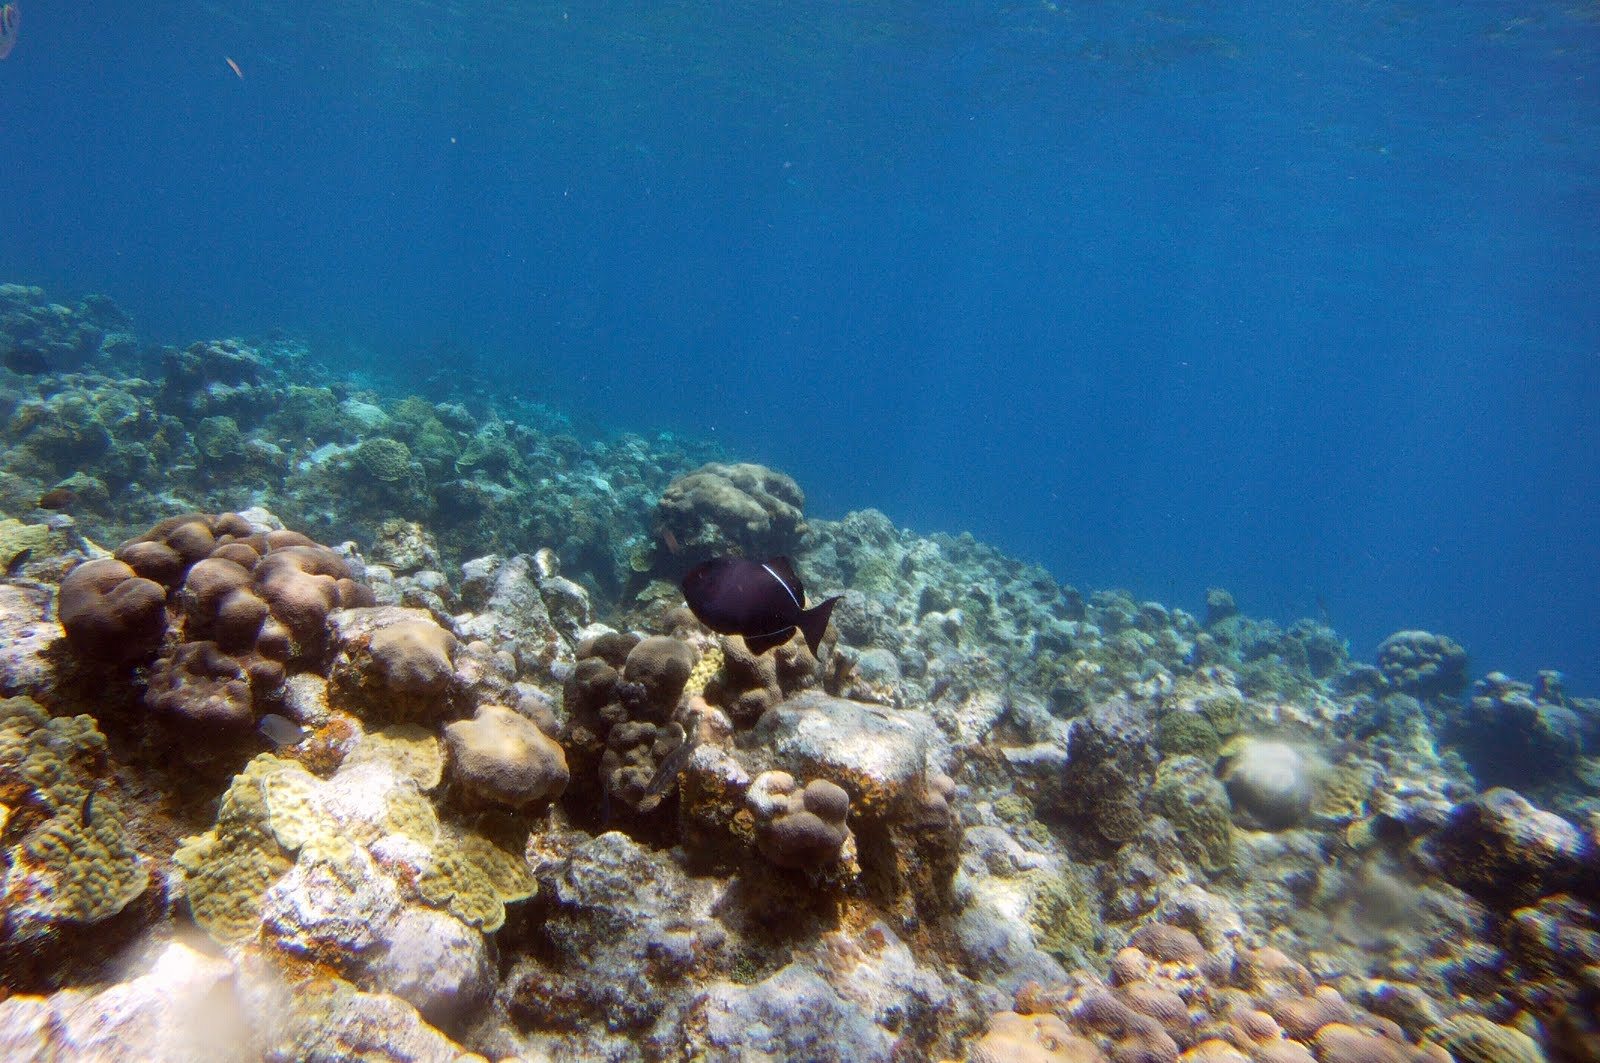 Underwater Ocean Rocks Underwater at eden s rock Underwater Ocean Rocks